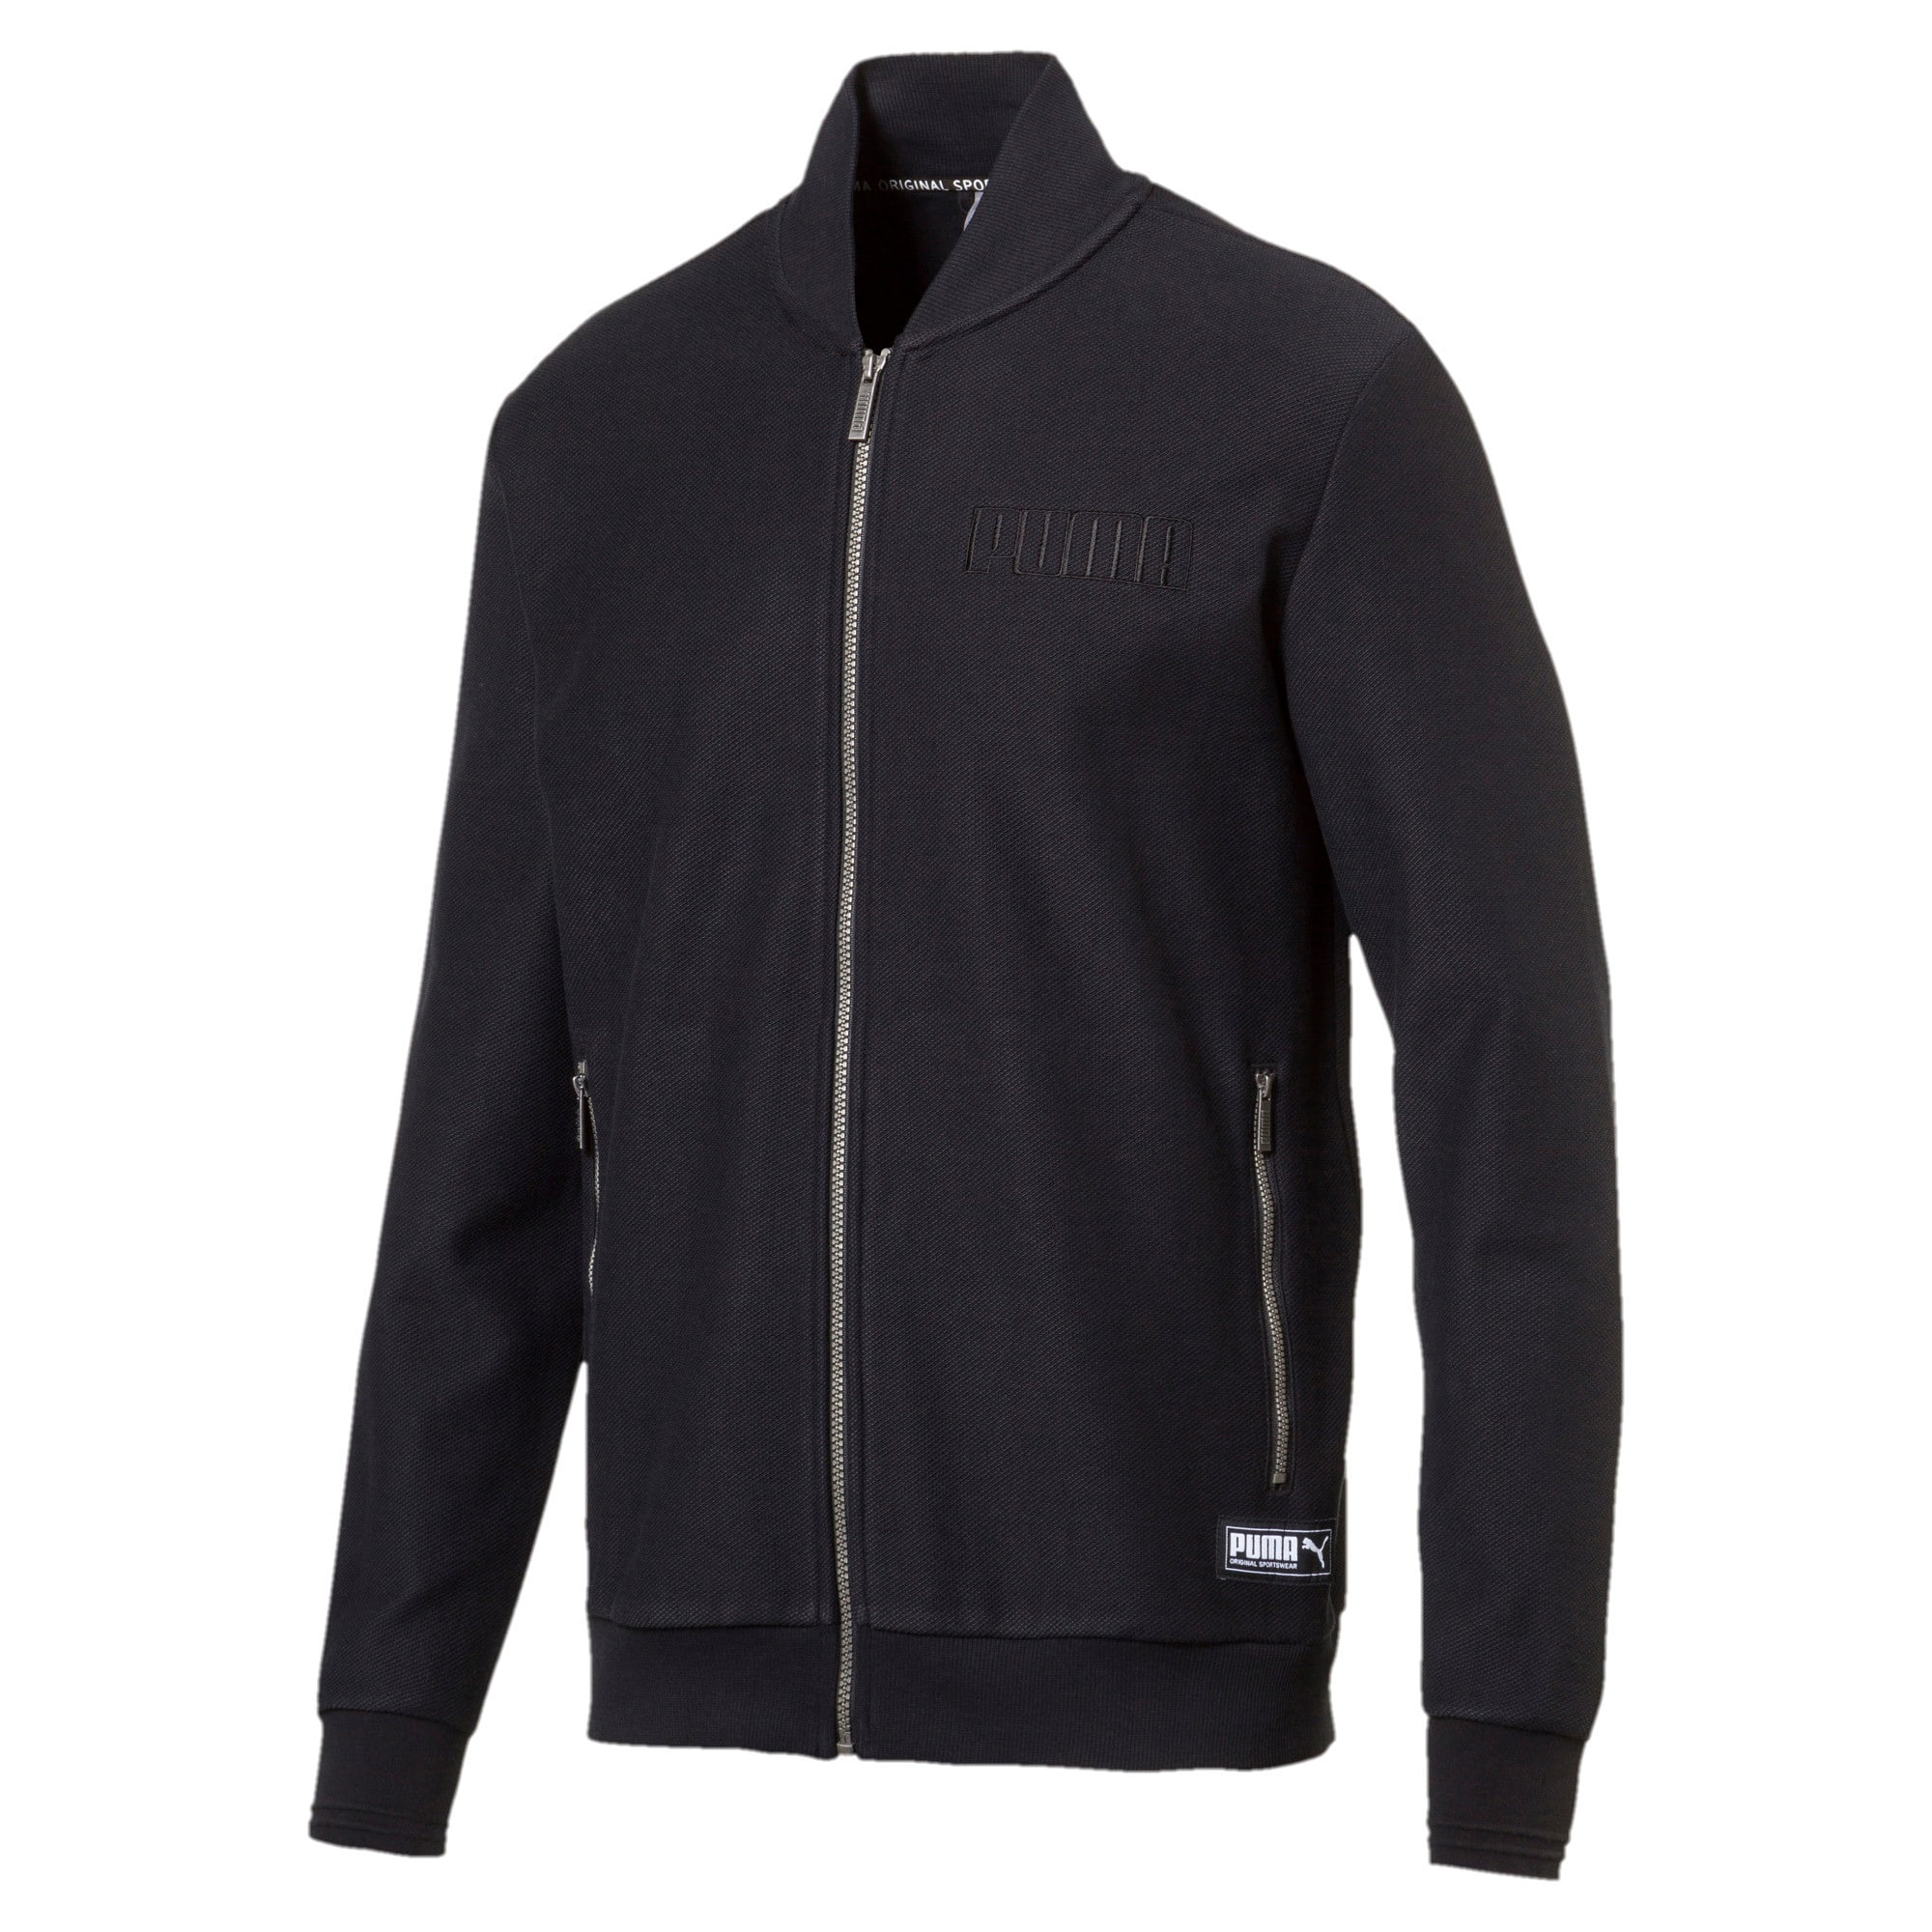 Thumbnail 1 of Athletic premium jacket, Cotton Black, medium